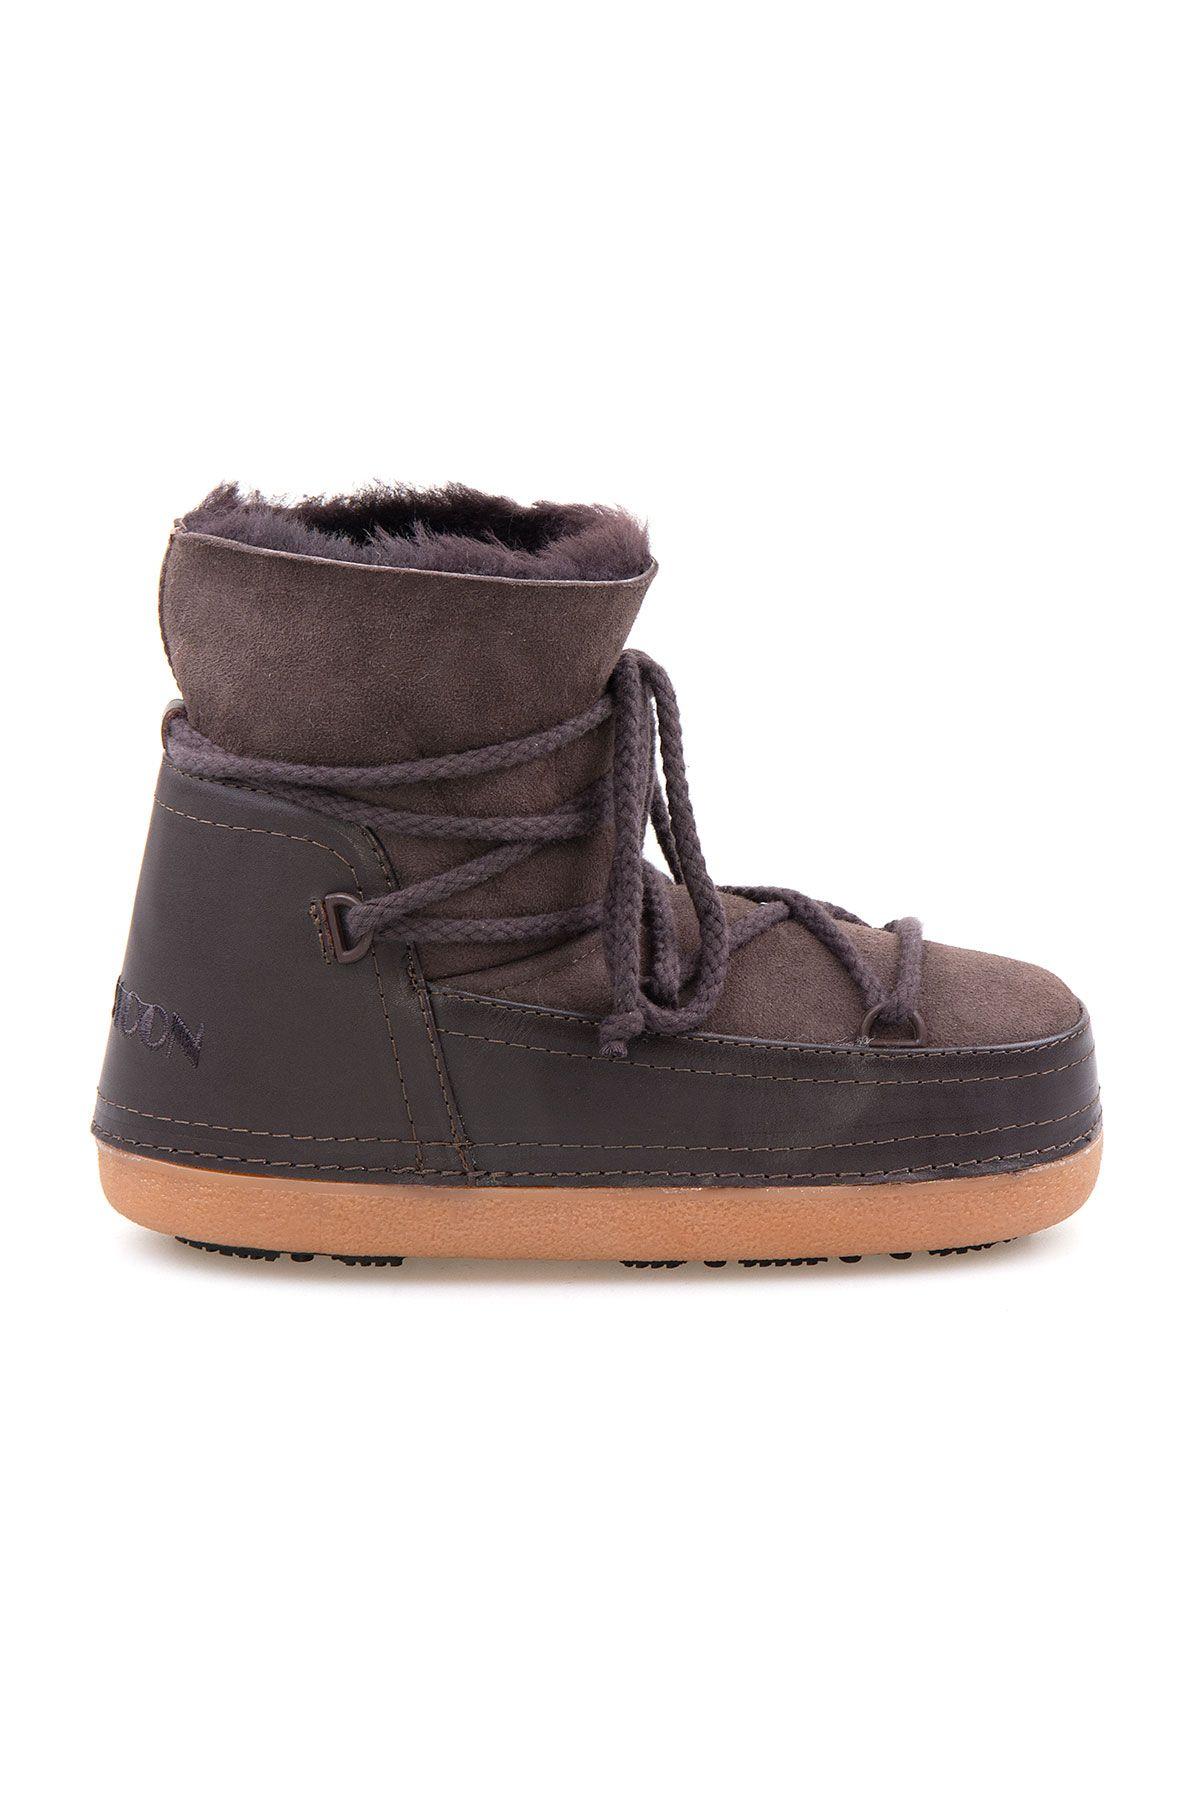 Cool Moon Genuine Sheepskin Women Snow Boots 251001 Brown